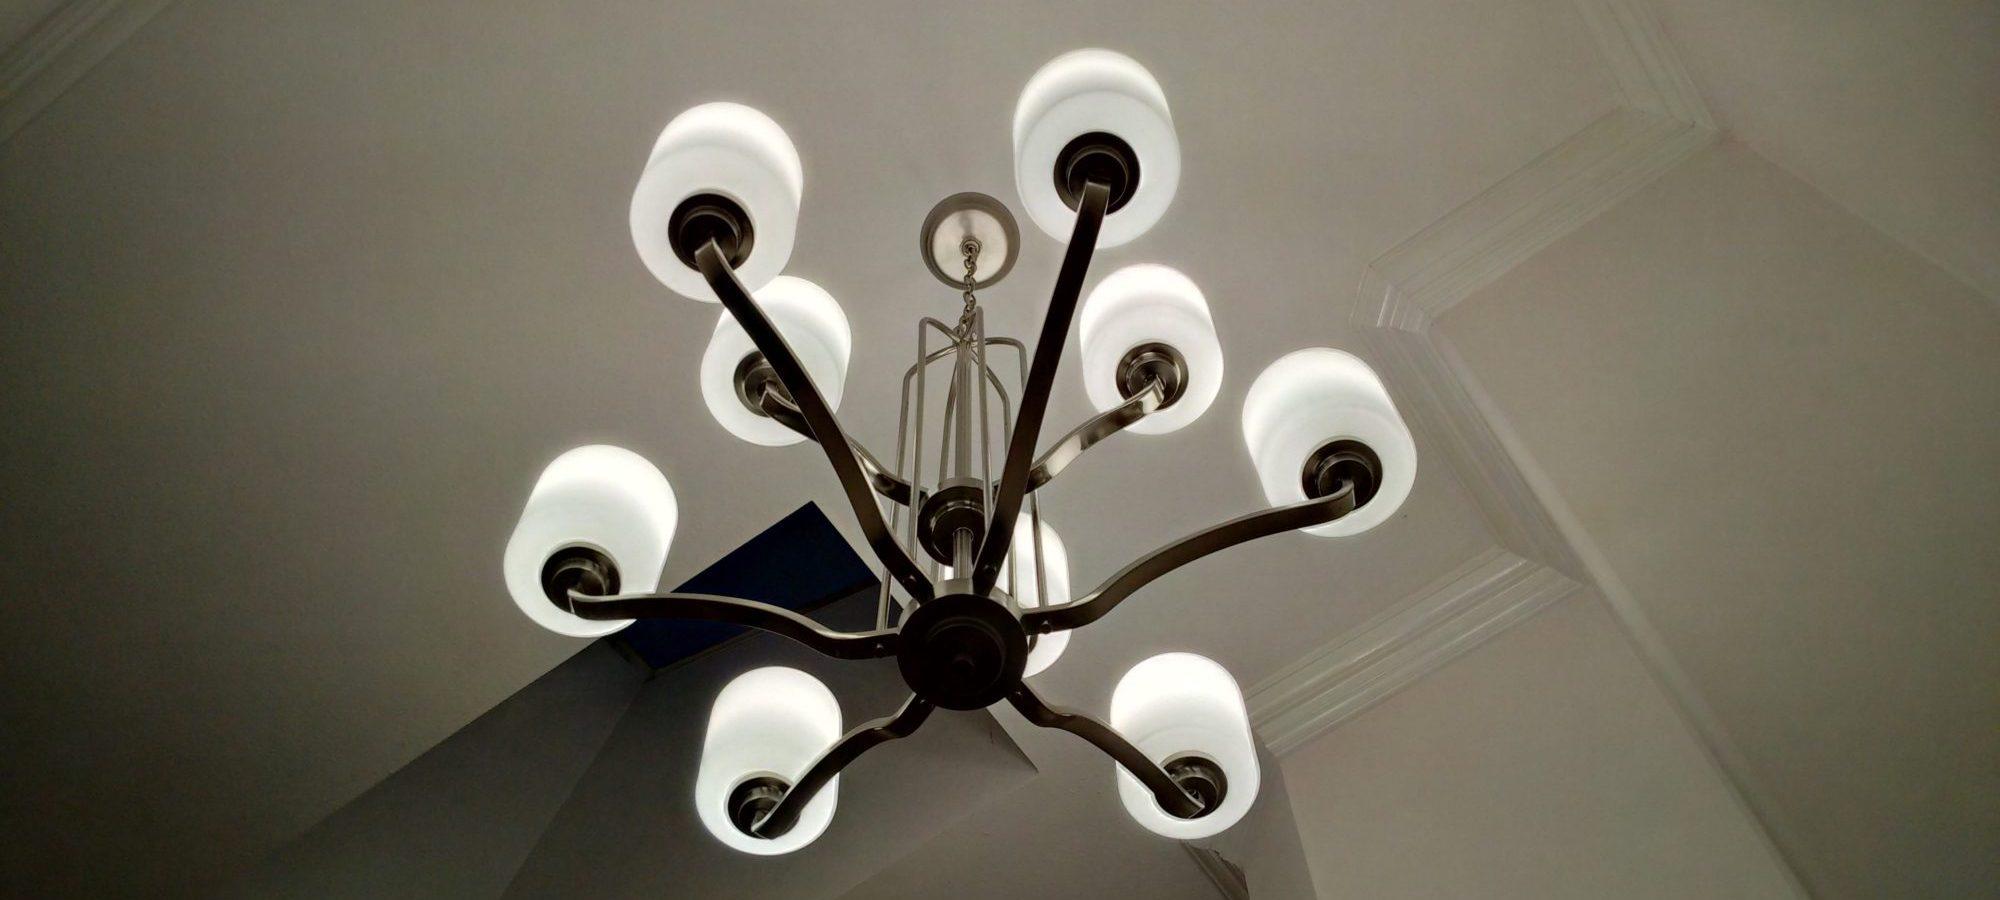 choose custom home electrical options